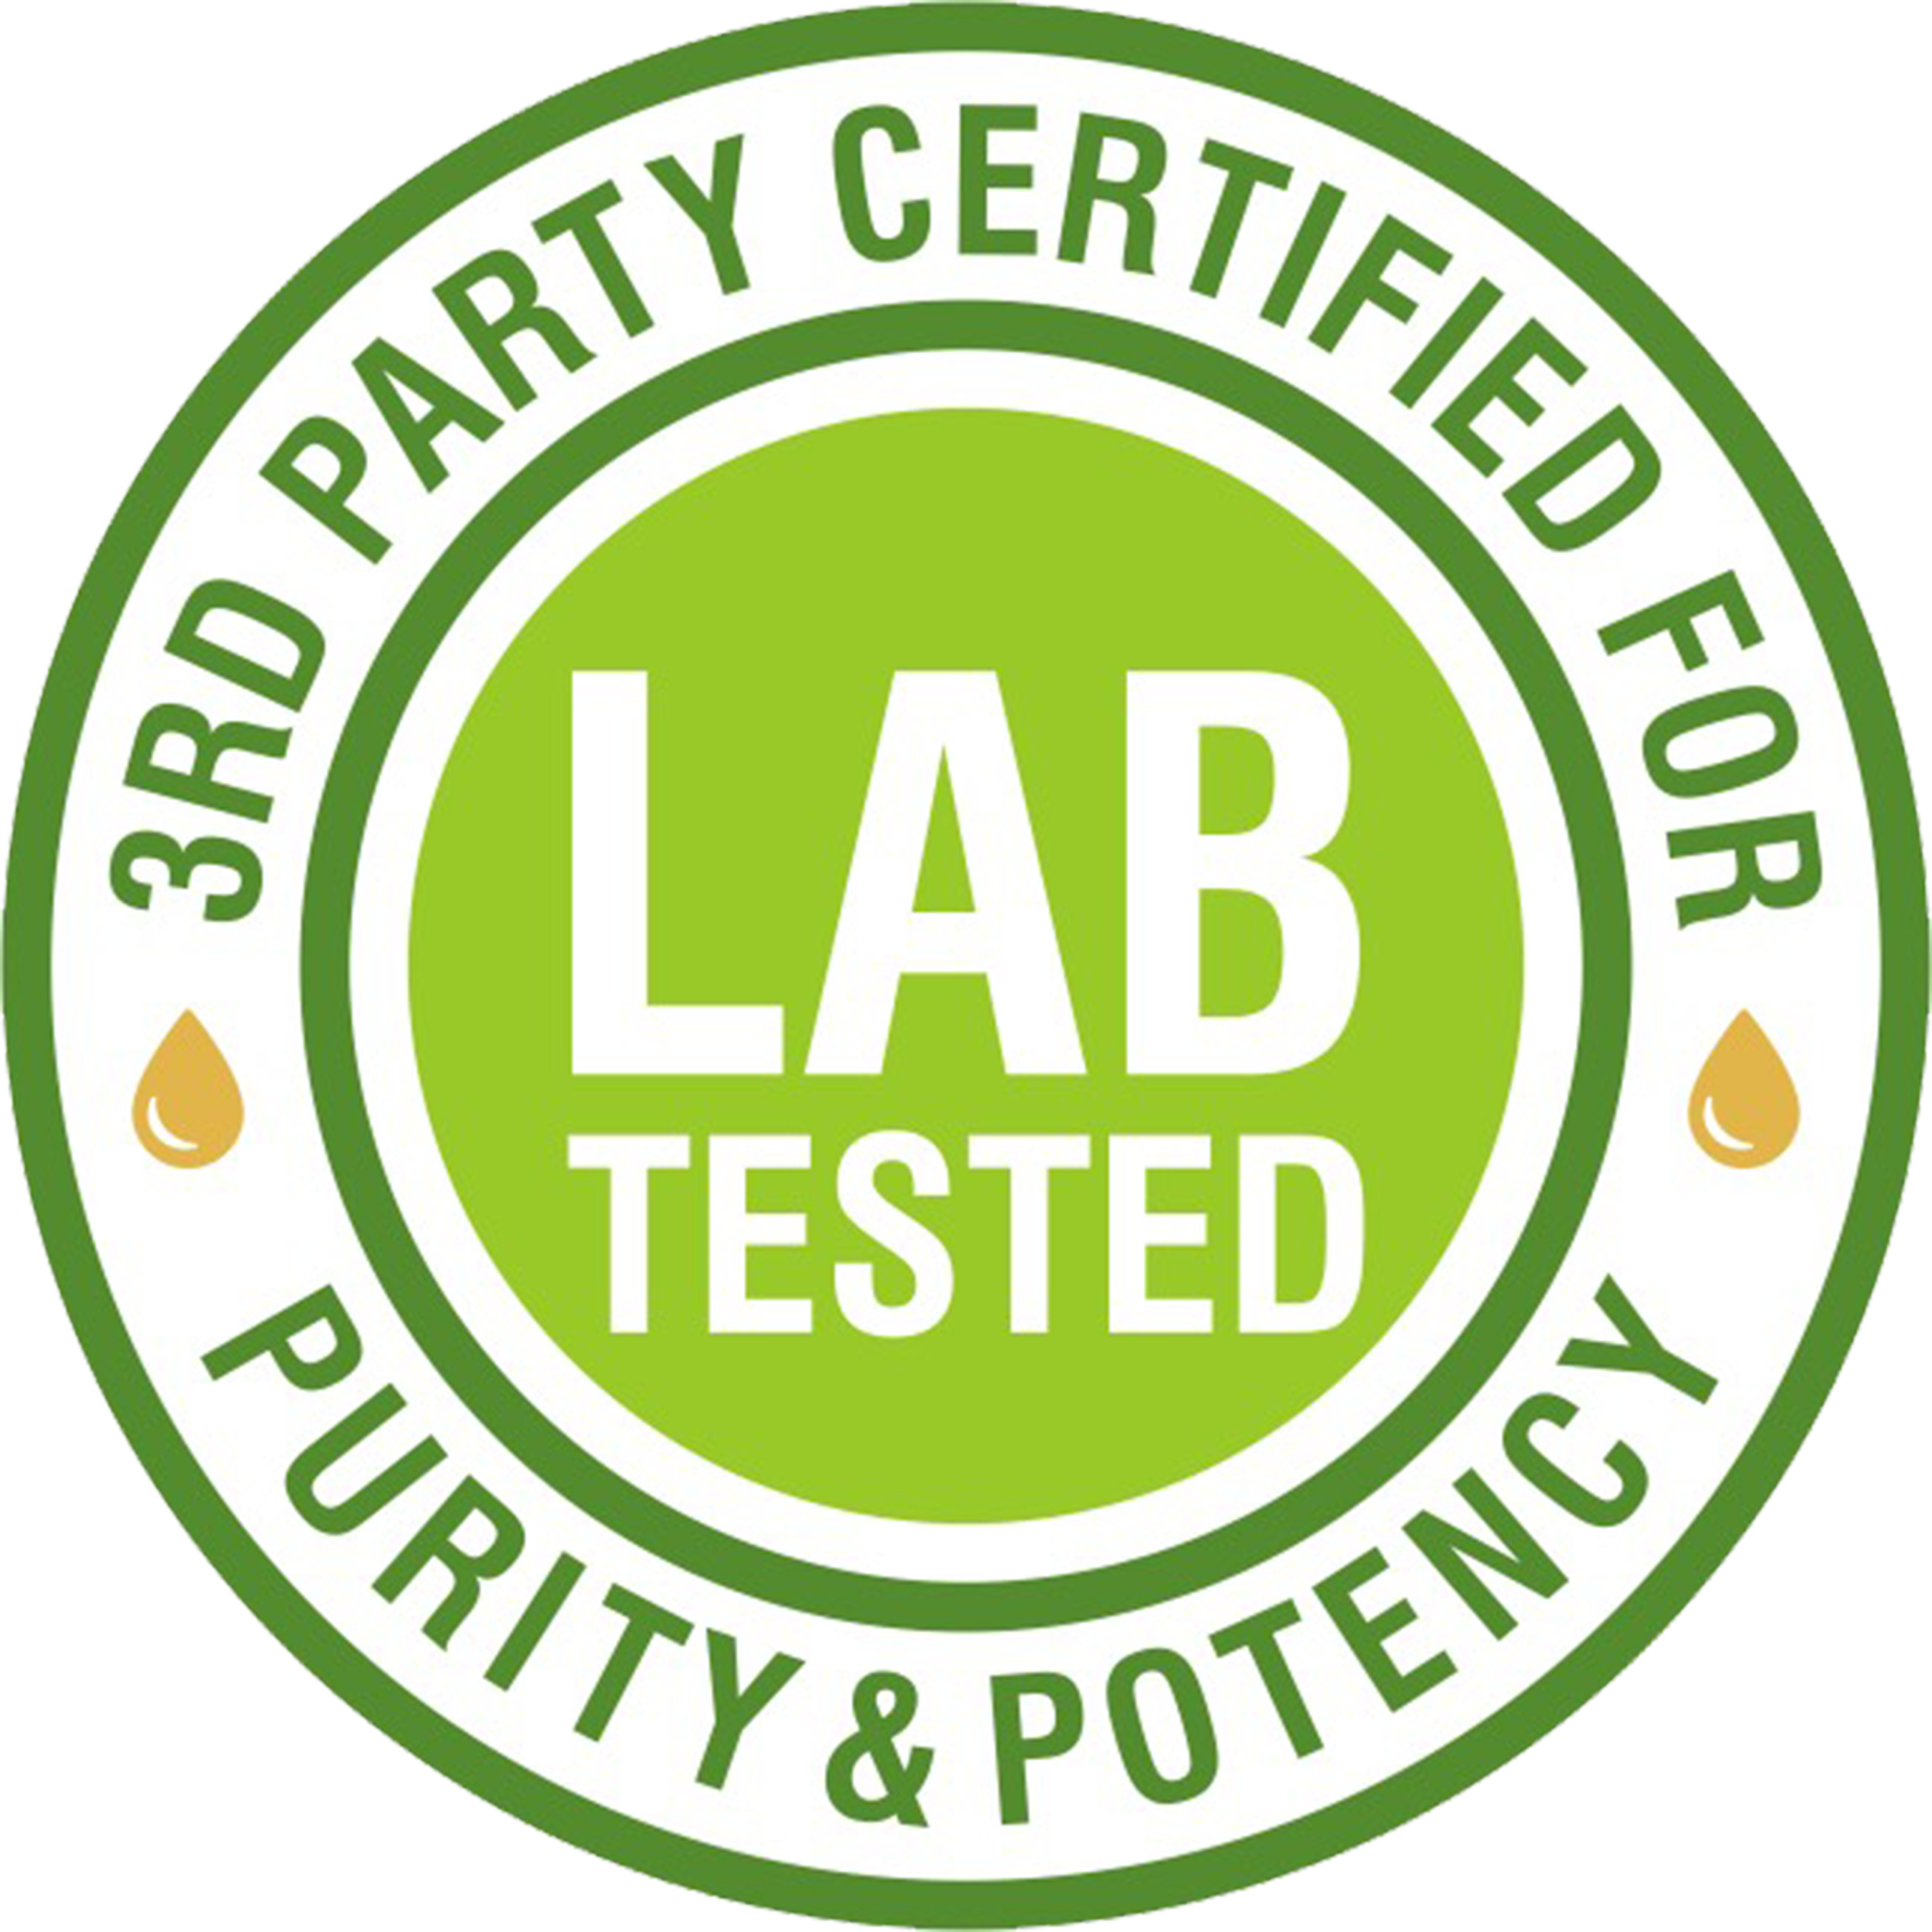 Third party laboratory verifie